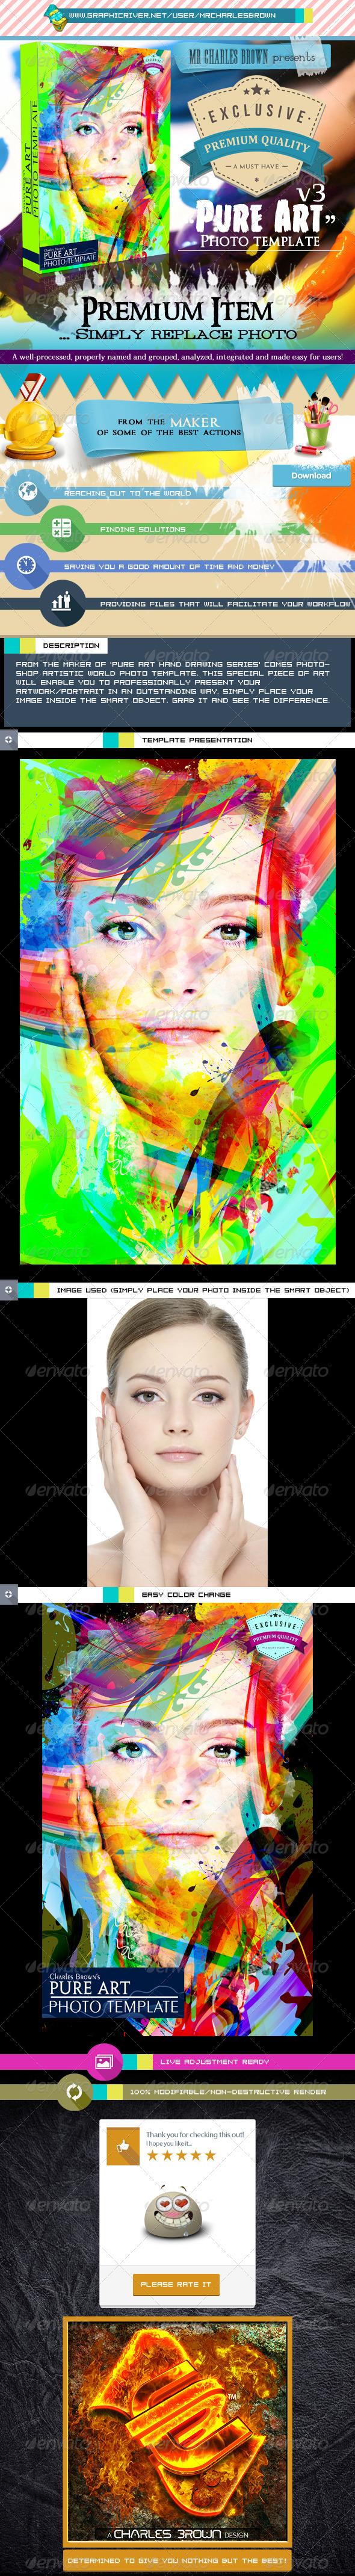 GraphicRiver Pure Art Photo Template v3 6161828